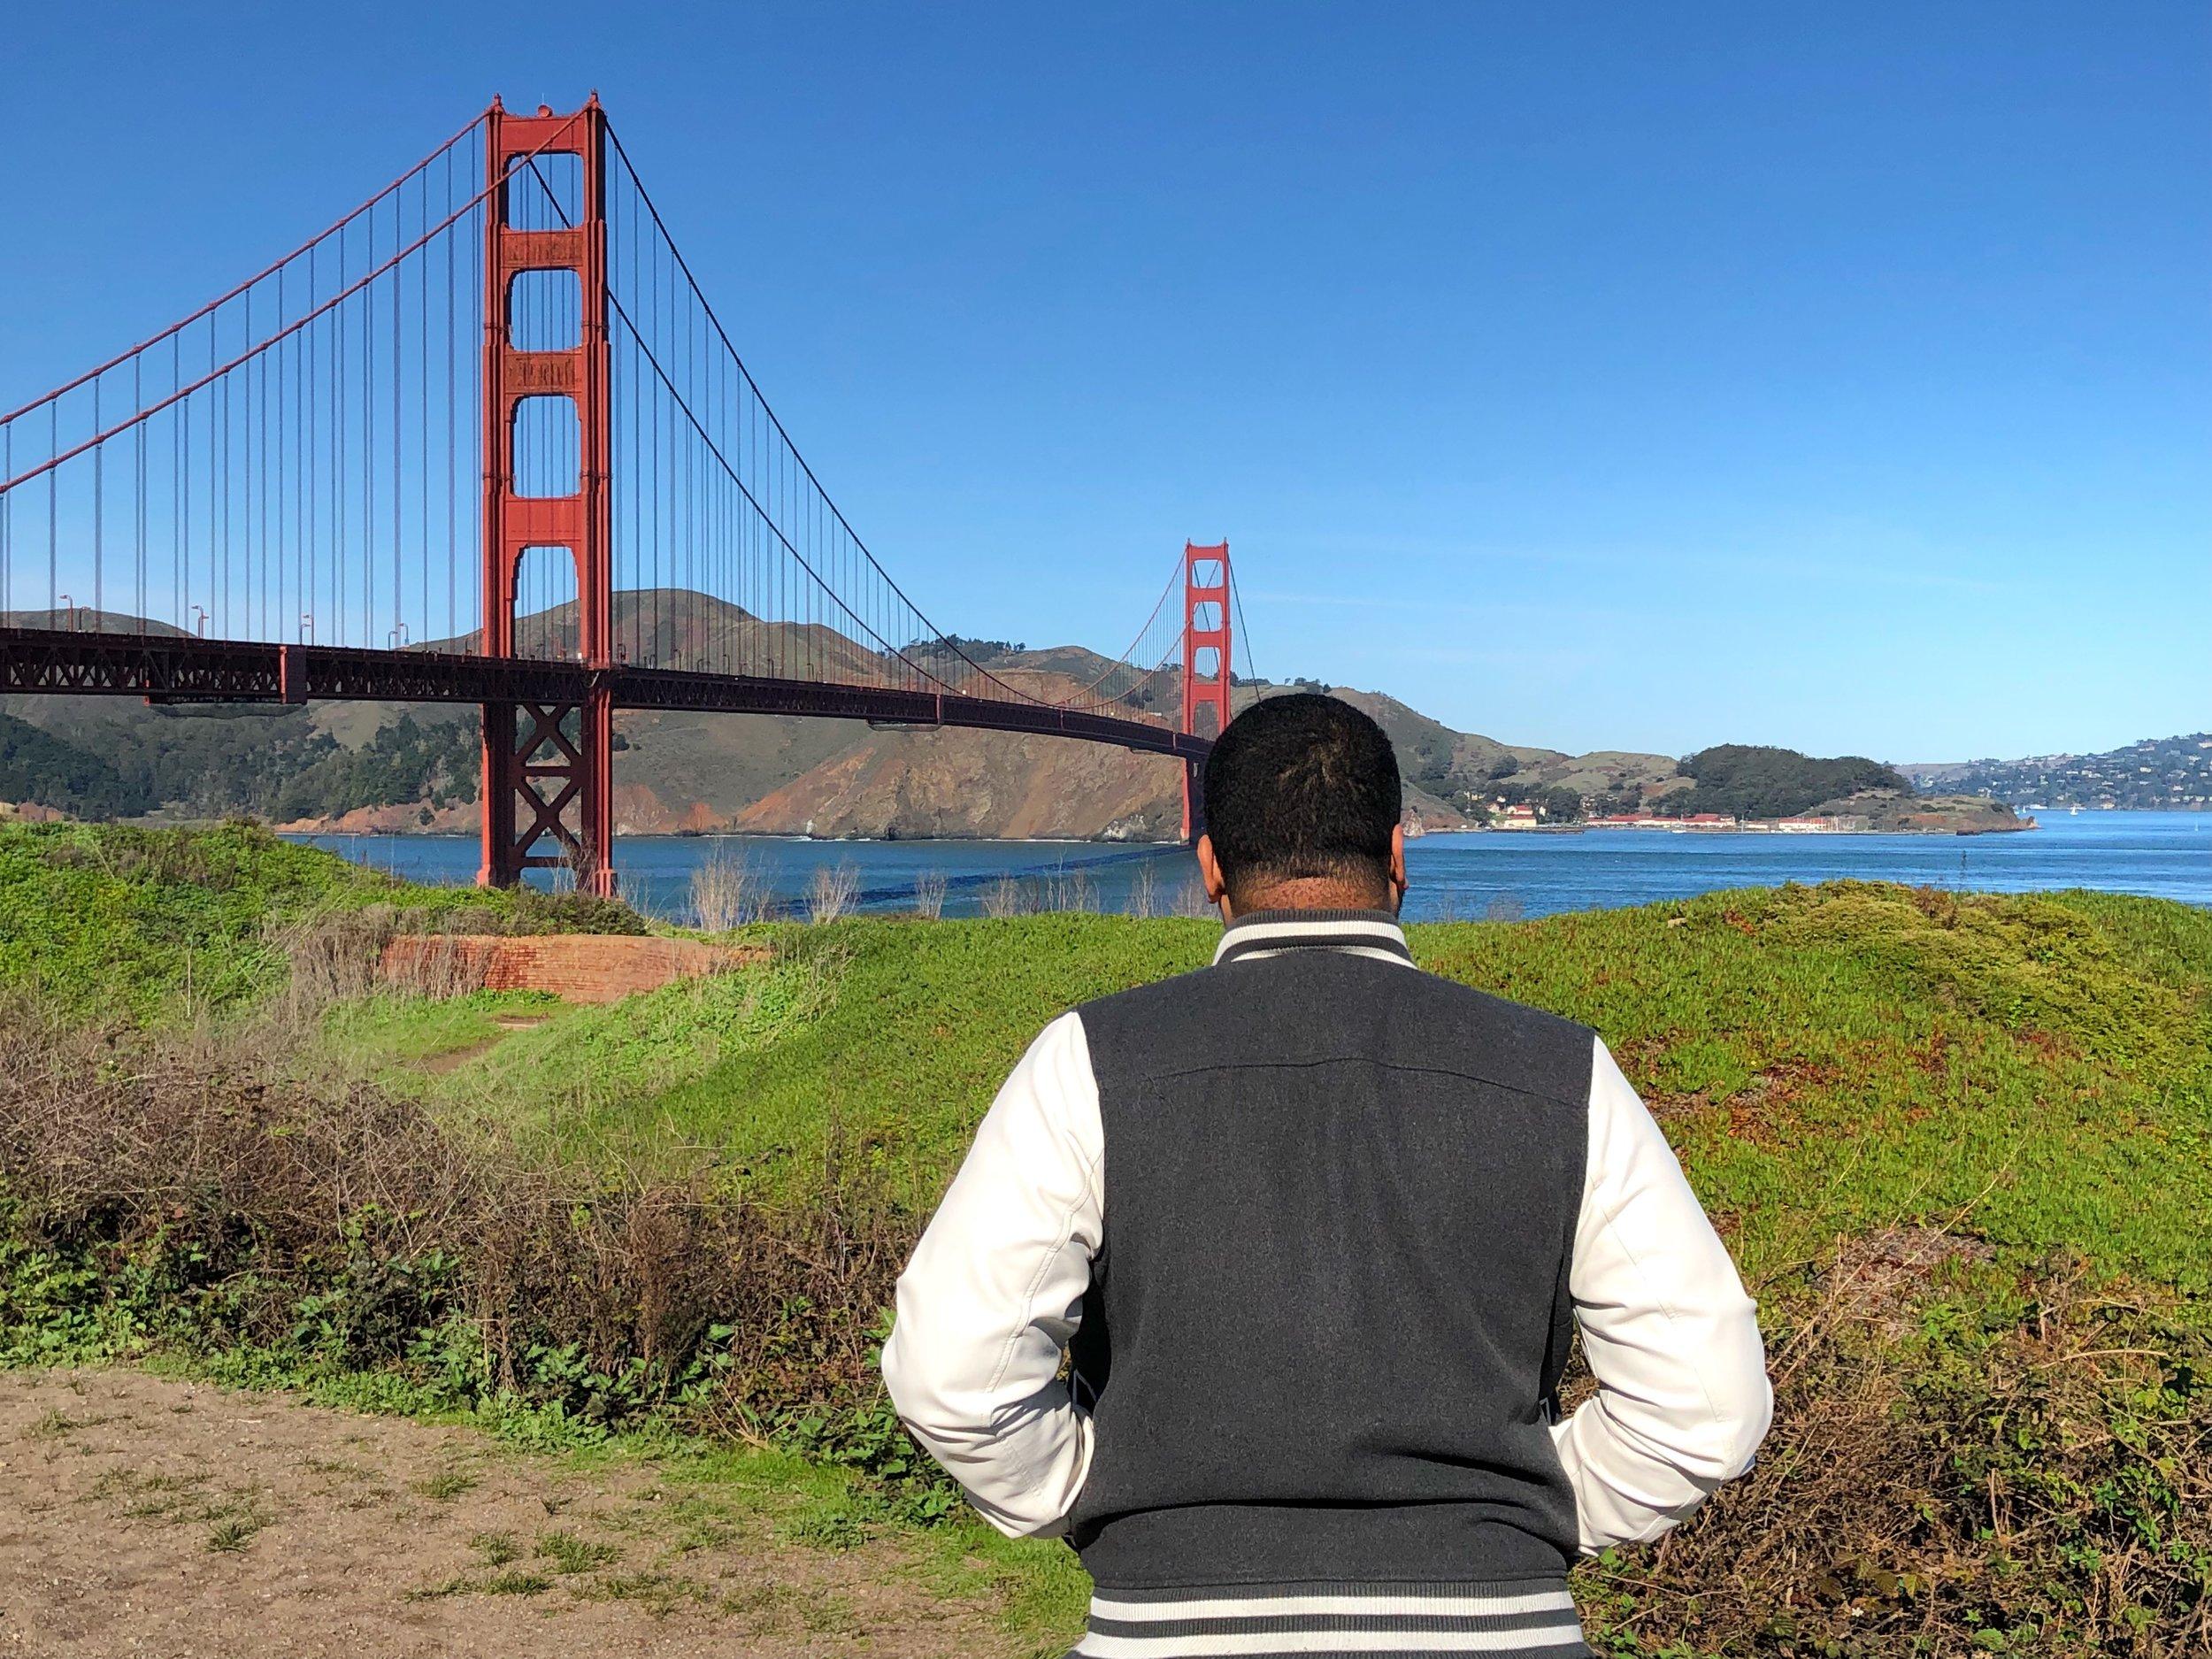 The famous Golden Gate Bridge, located in San Francisco, CA